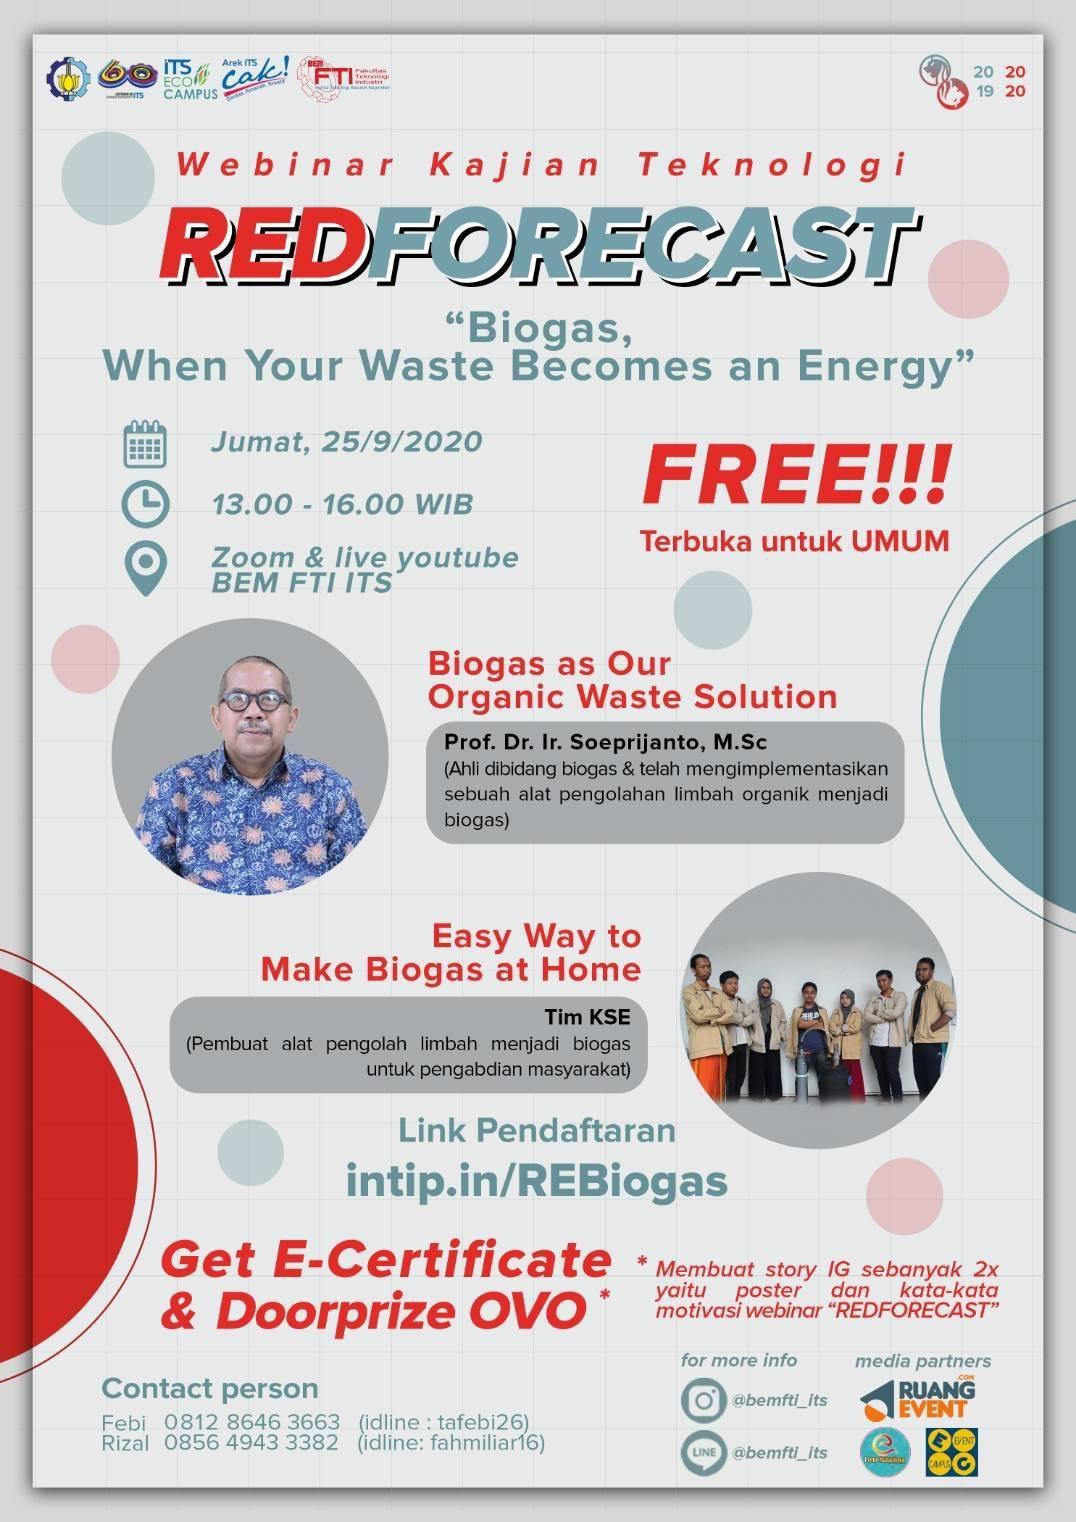 REDFORECAST: Webinar Kajian Teknologi